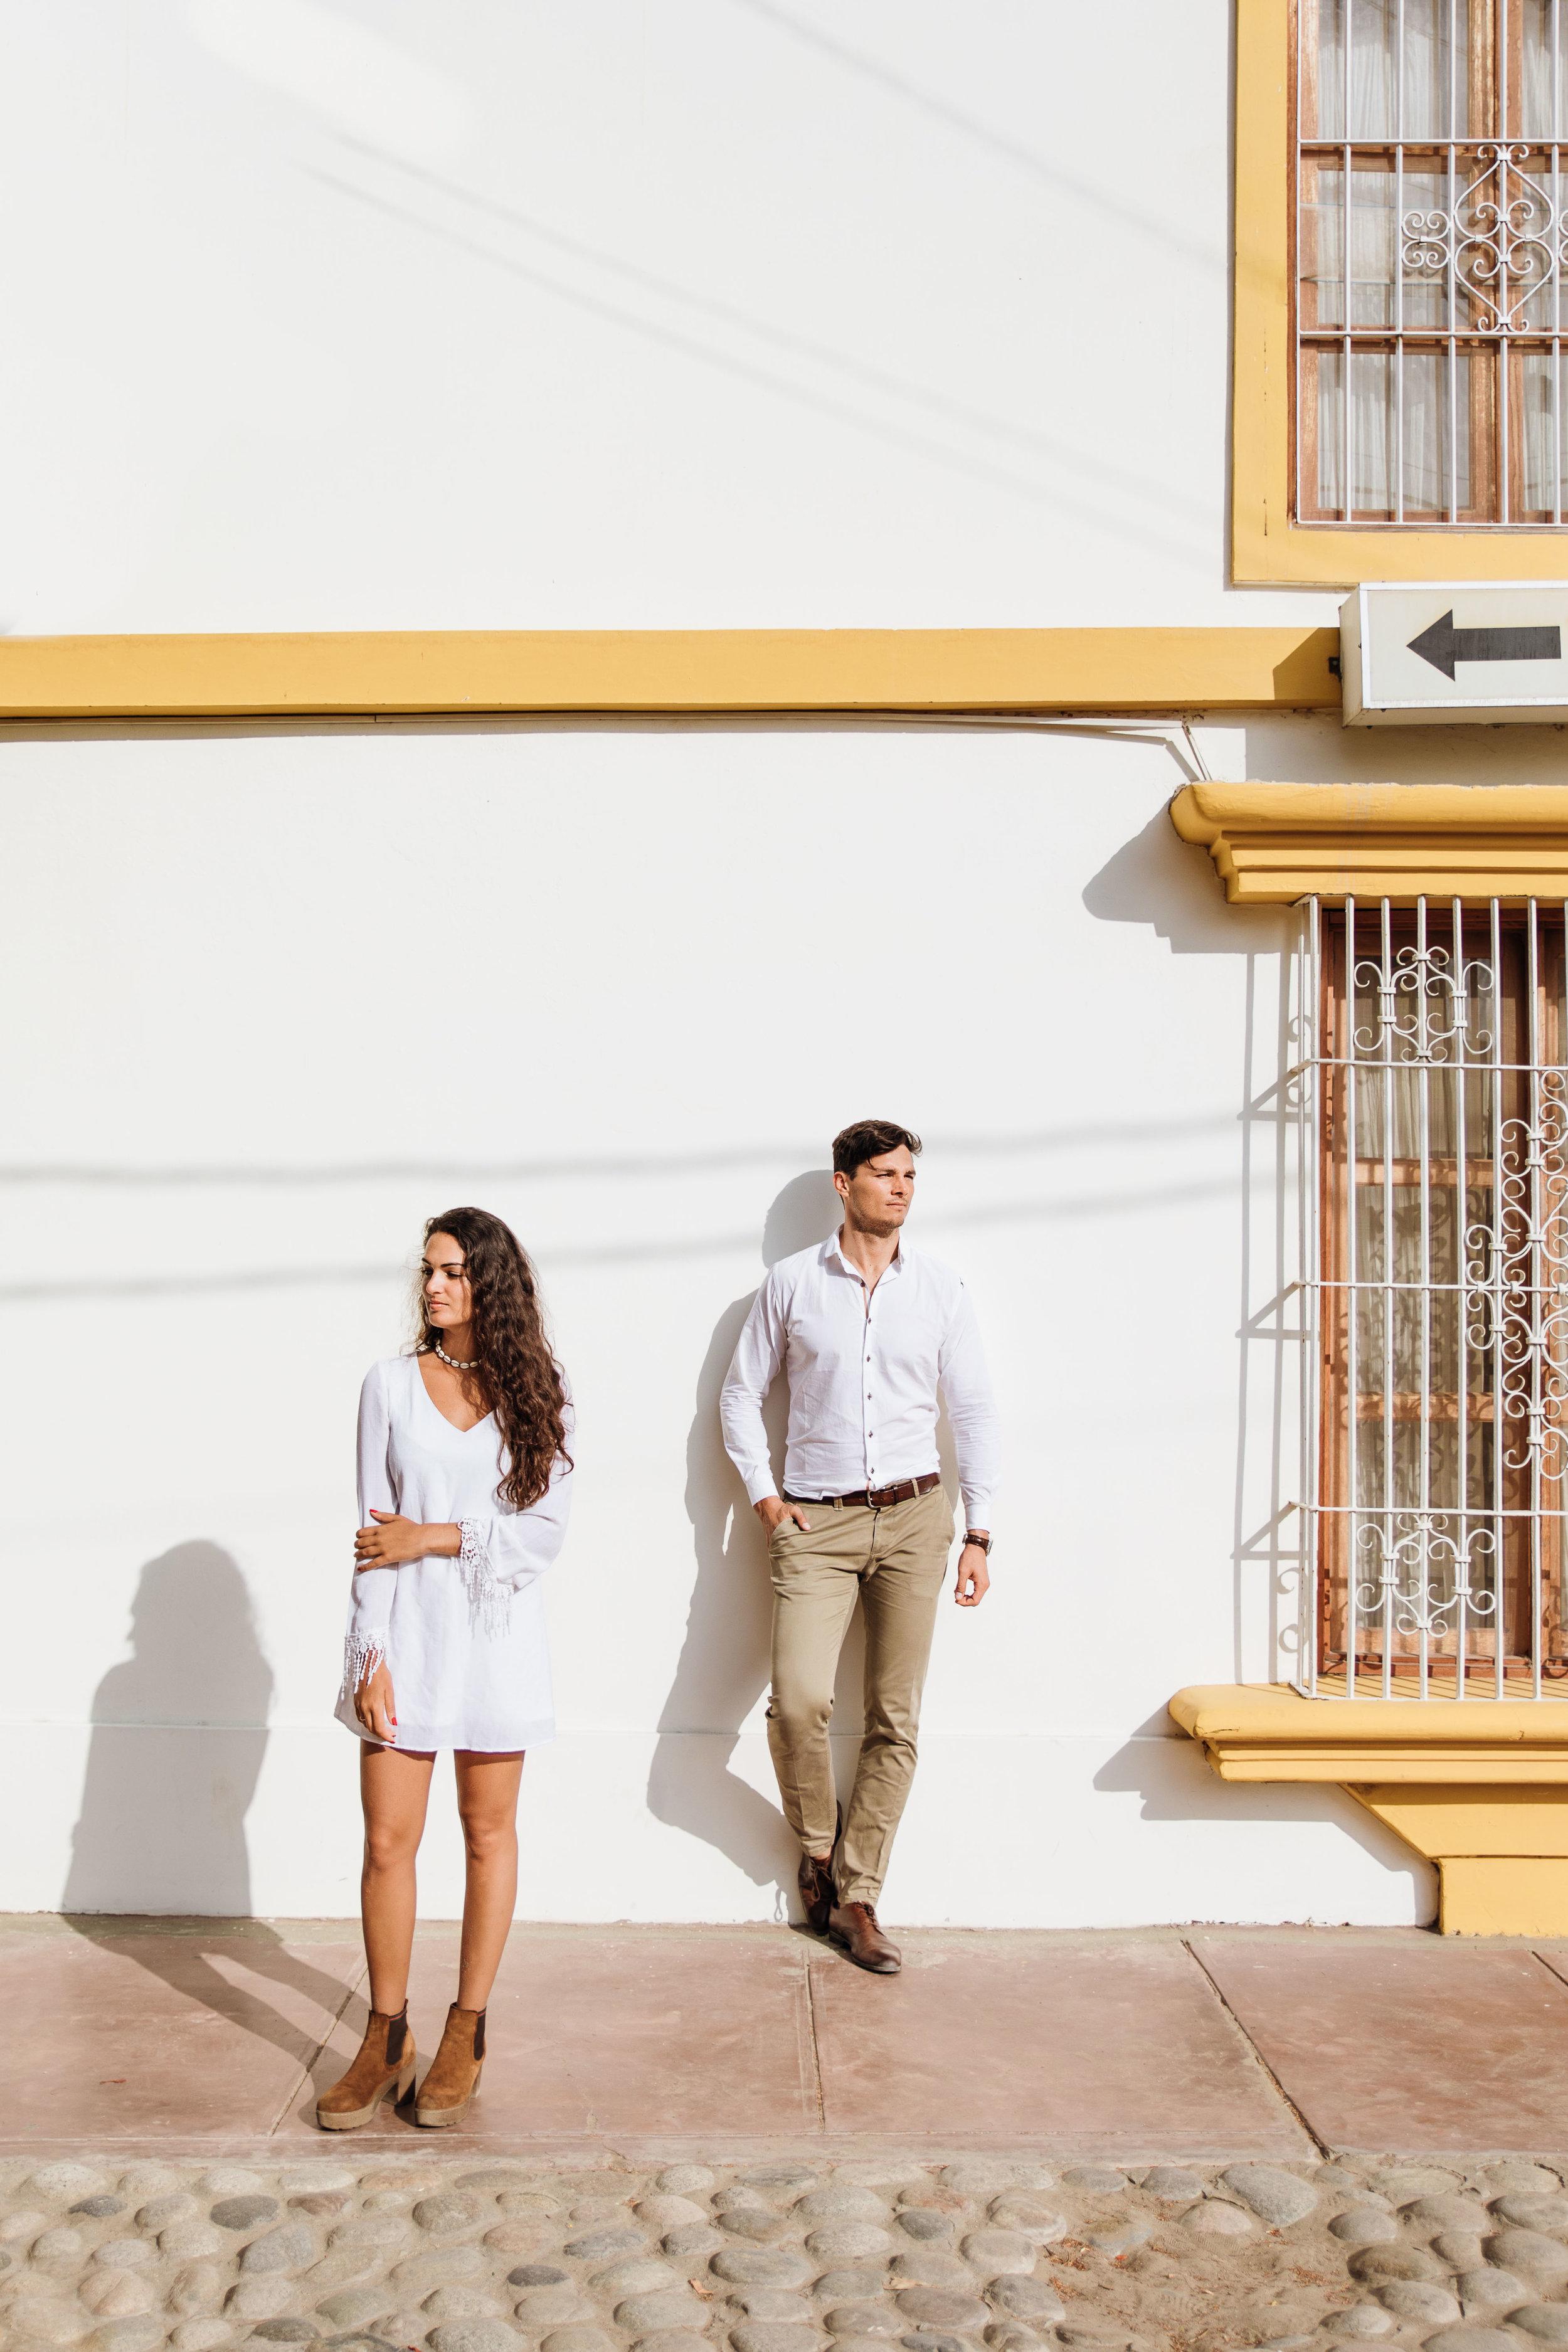 huacachina-peru-honeymoon-elopement-destination-wedding-photography-michael-cozzens-46.jpg